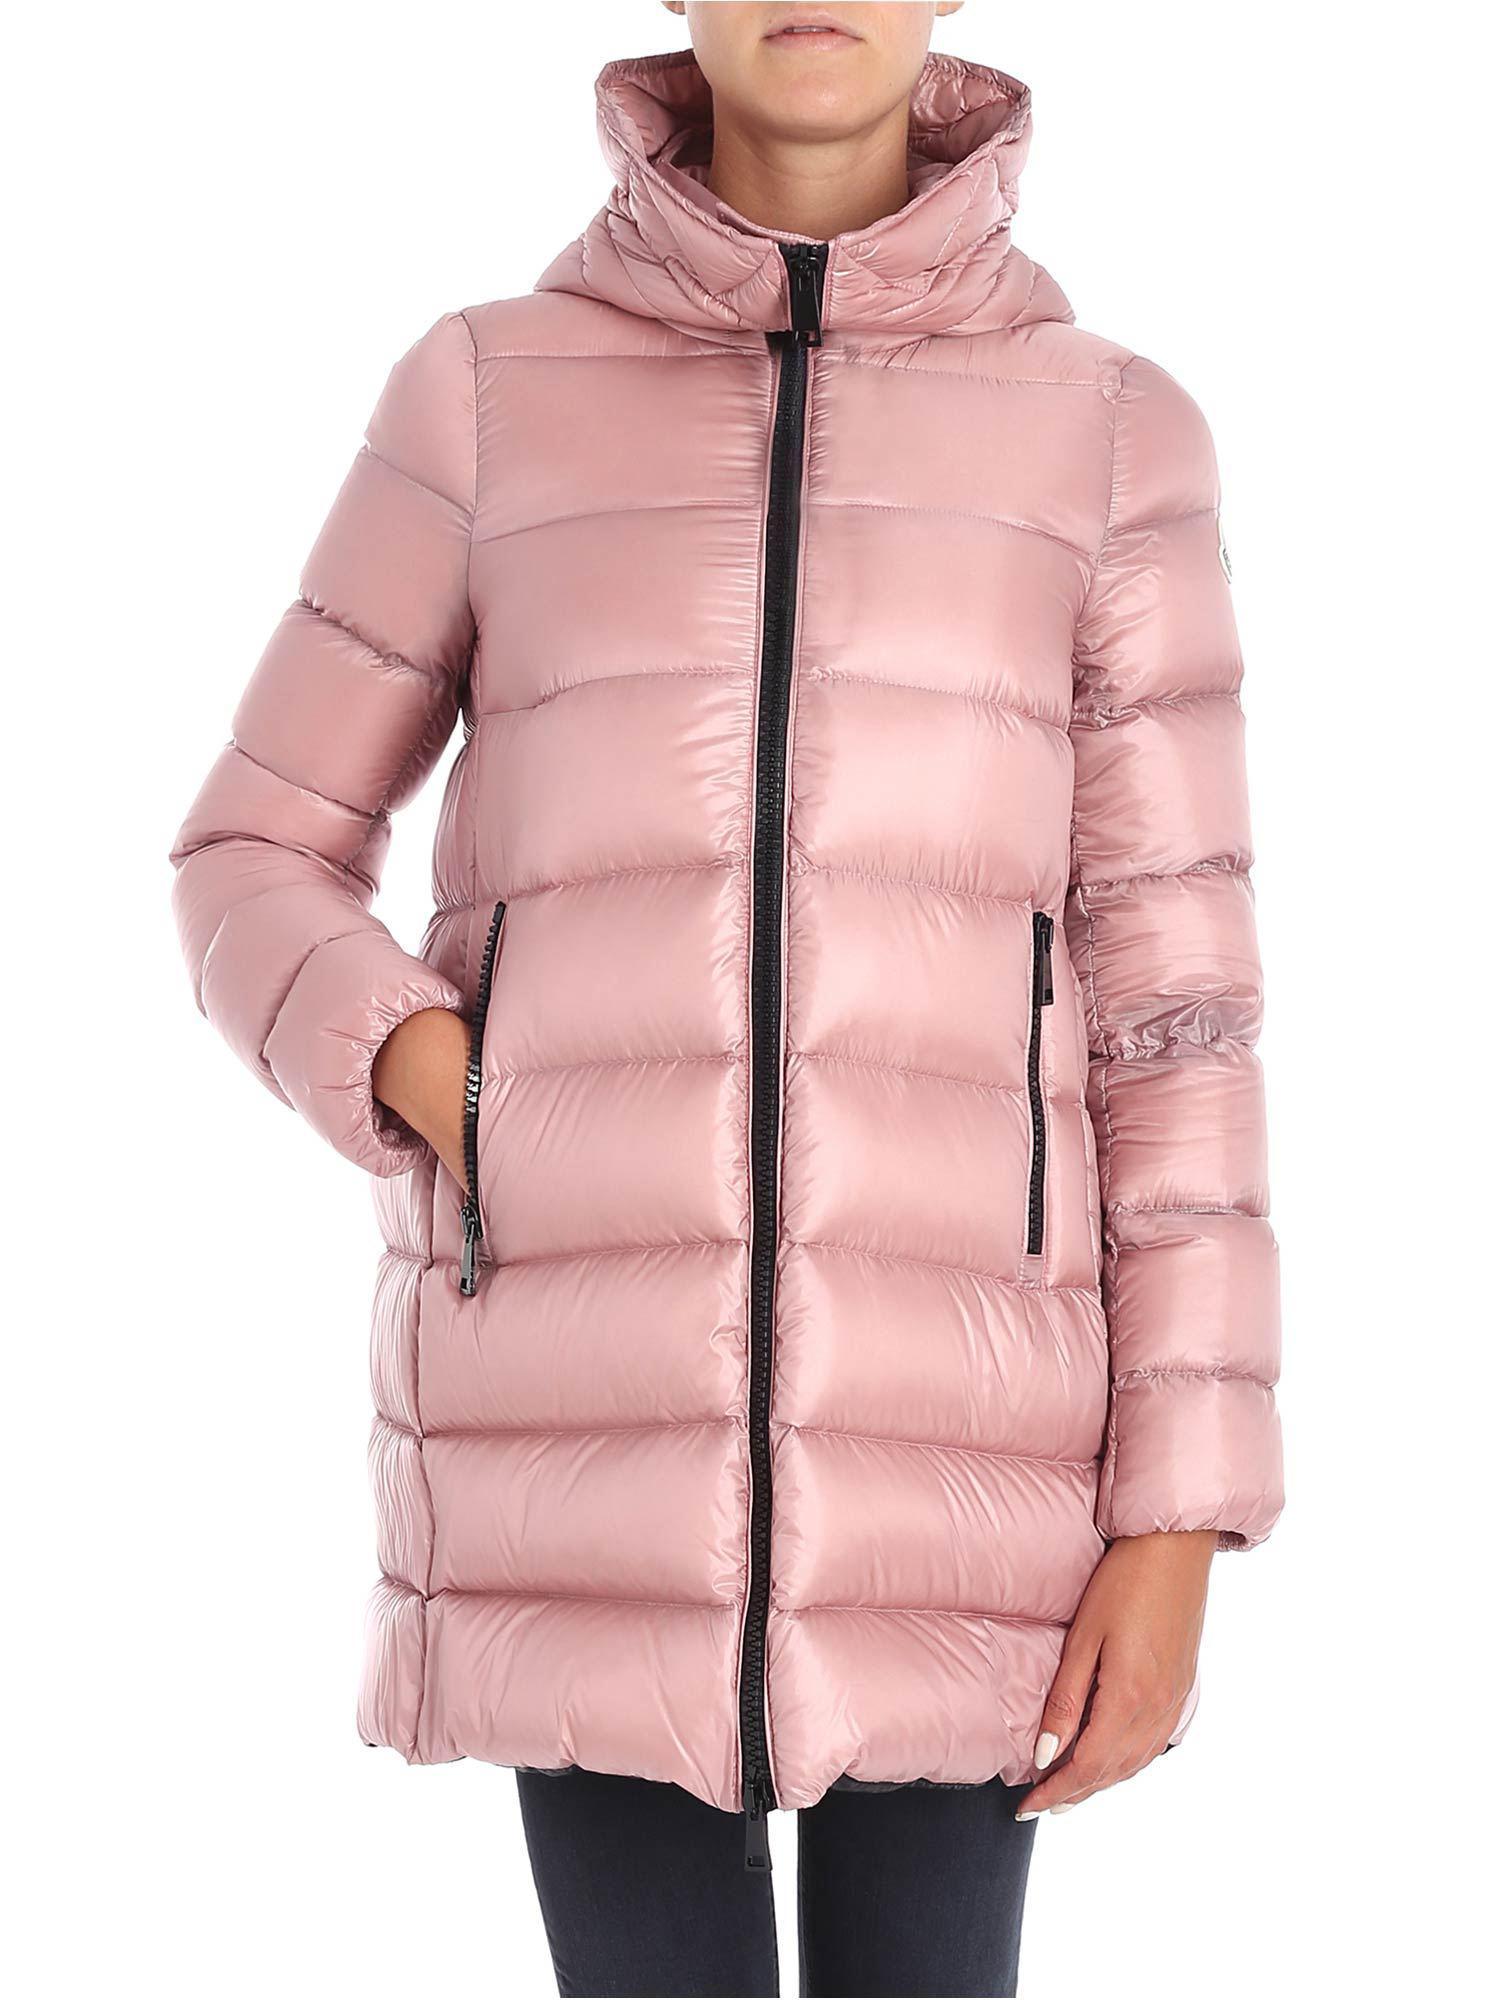 moncler jacket pink